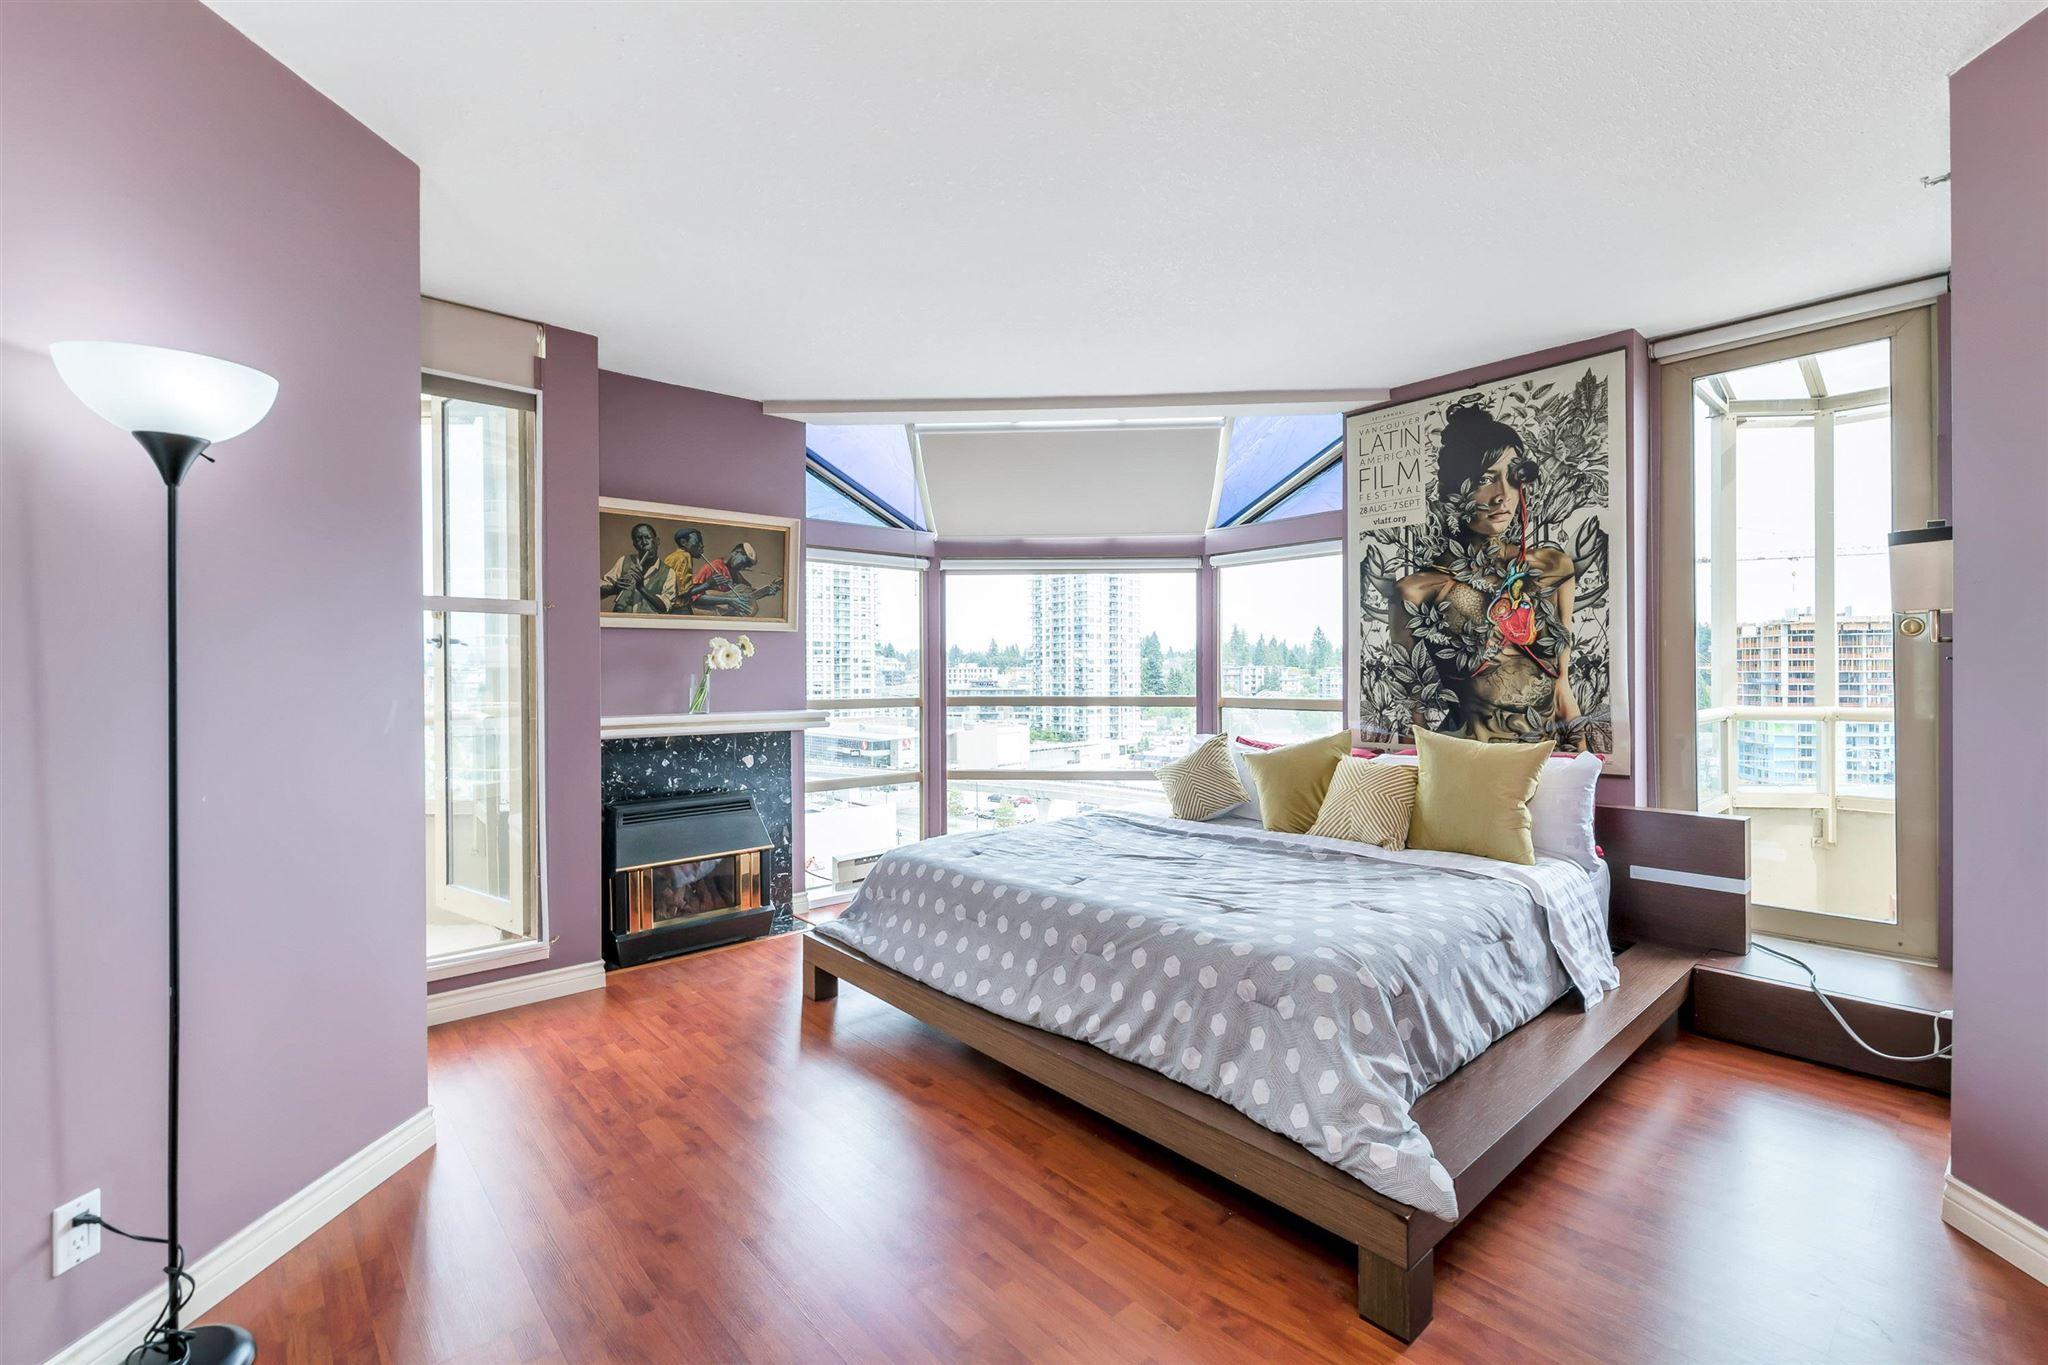 "Photo 31: Photos: 1401 728 FARROW Street in Coquitlam: Coquitlam West Condo for sale in ""THE VICTORIA"" : MLS®# R2615321"